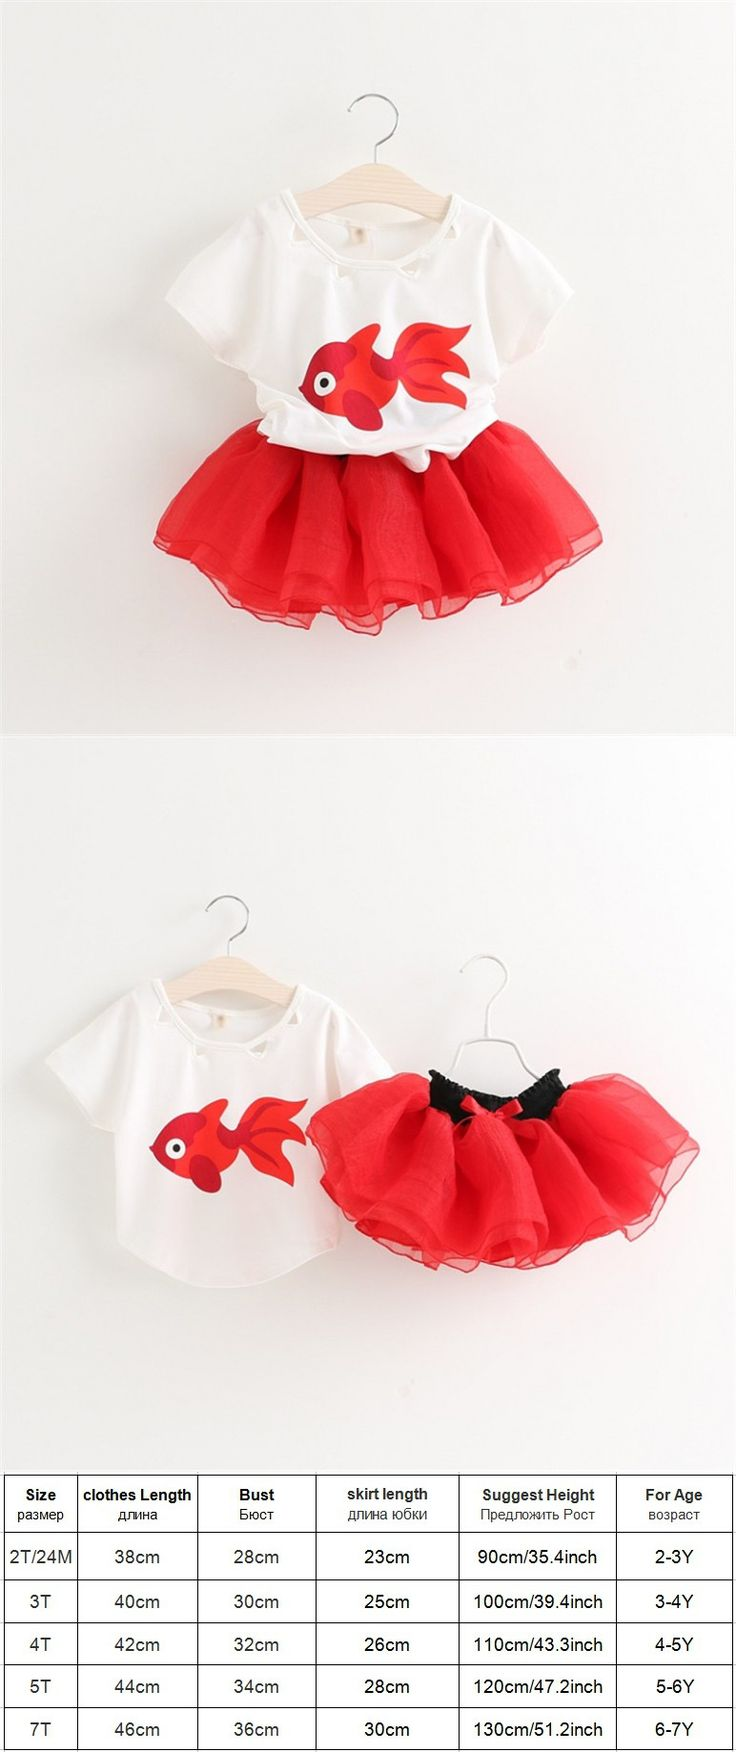 2-7T Fashion Kids clothes girls clothing sets summer style animal fish print t-shirt + red tutu skirt toddler girl clothing